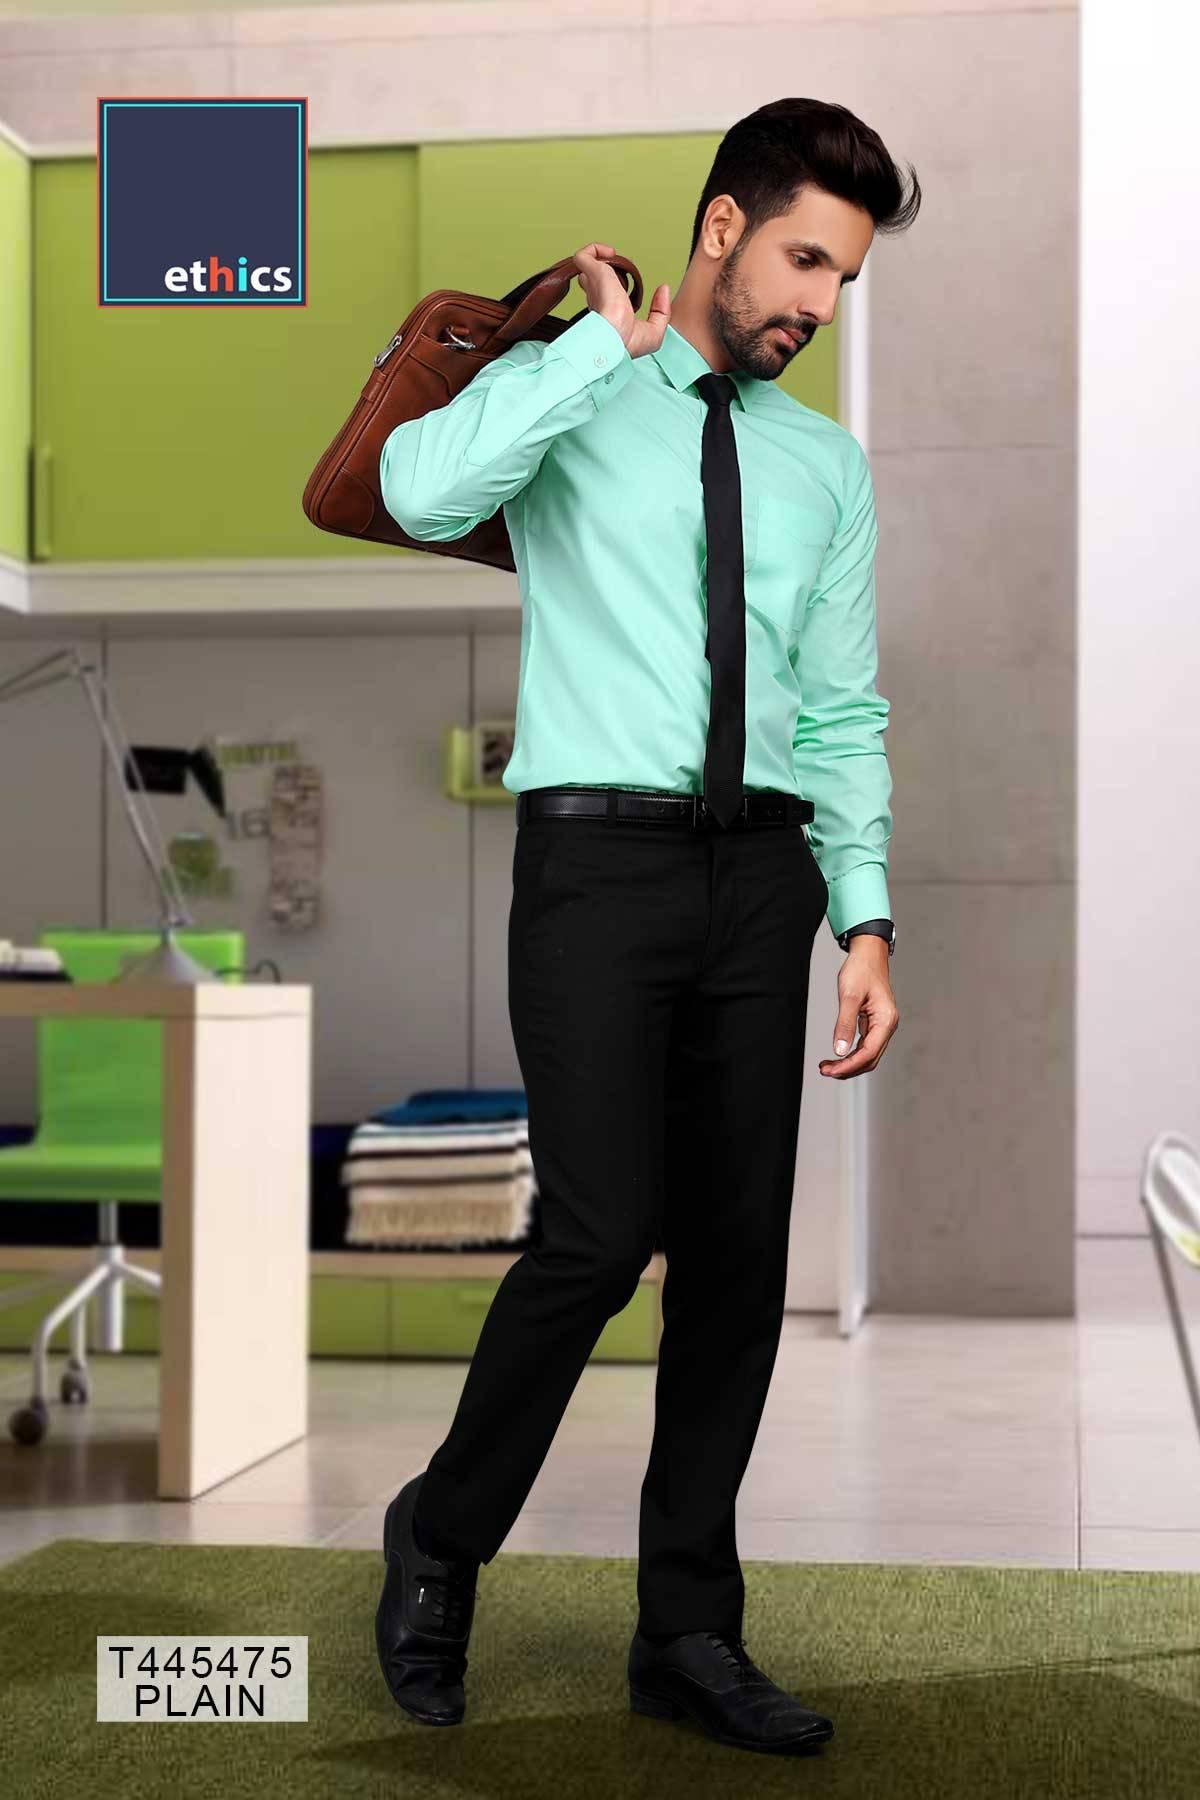 Sea Green Plain Corporate Uniform Readymade Shirts T-445475